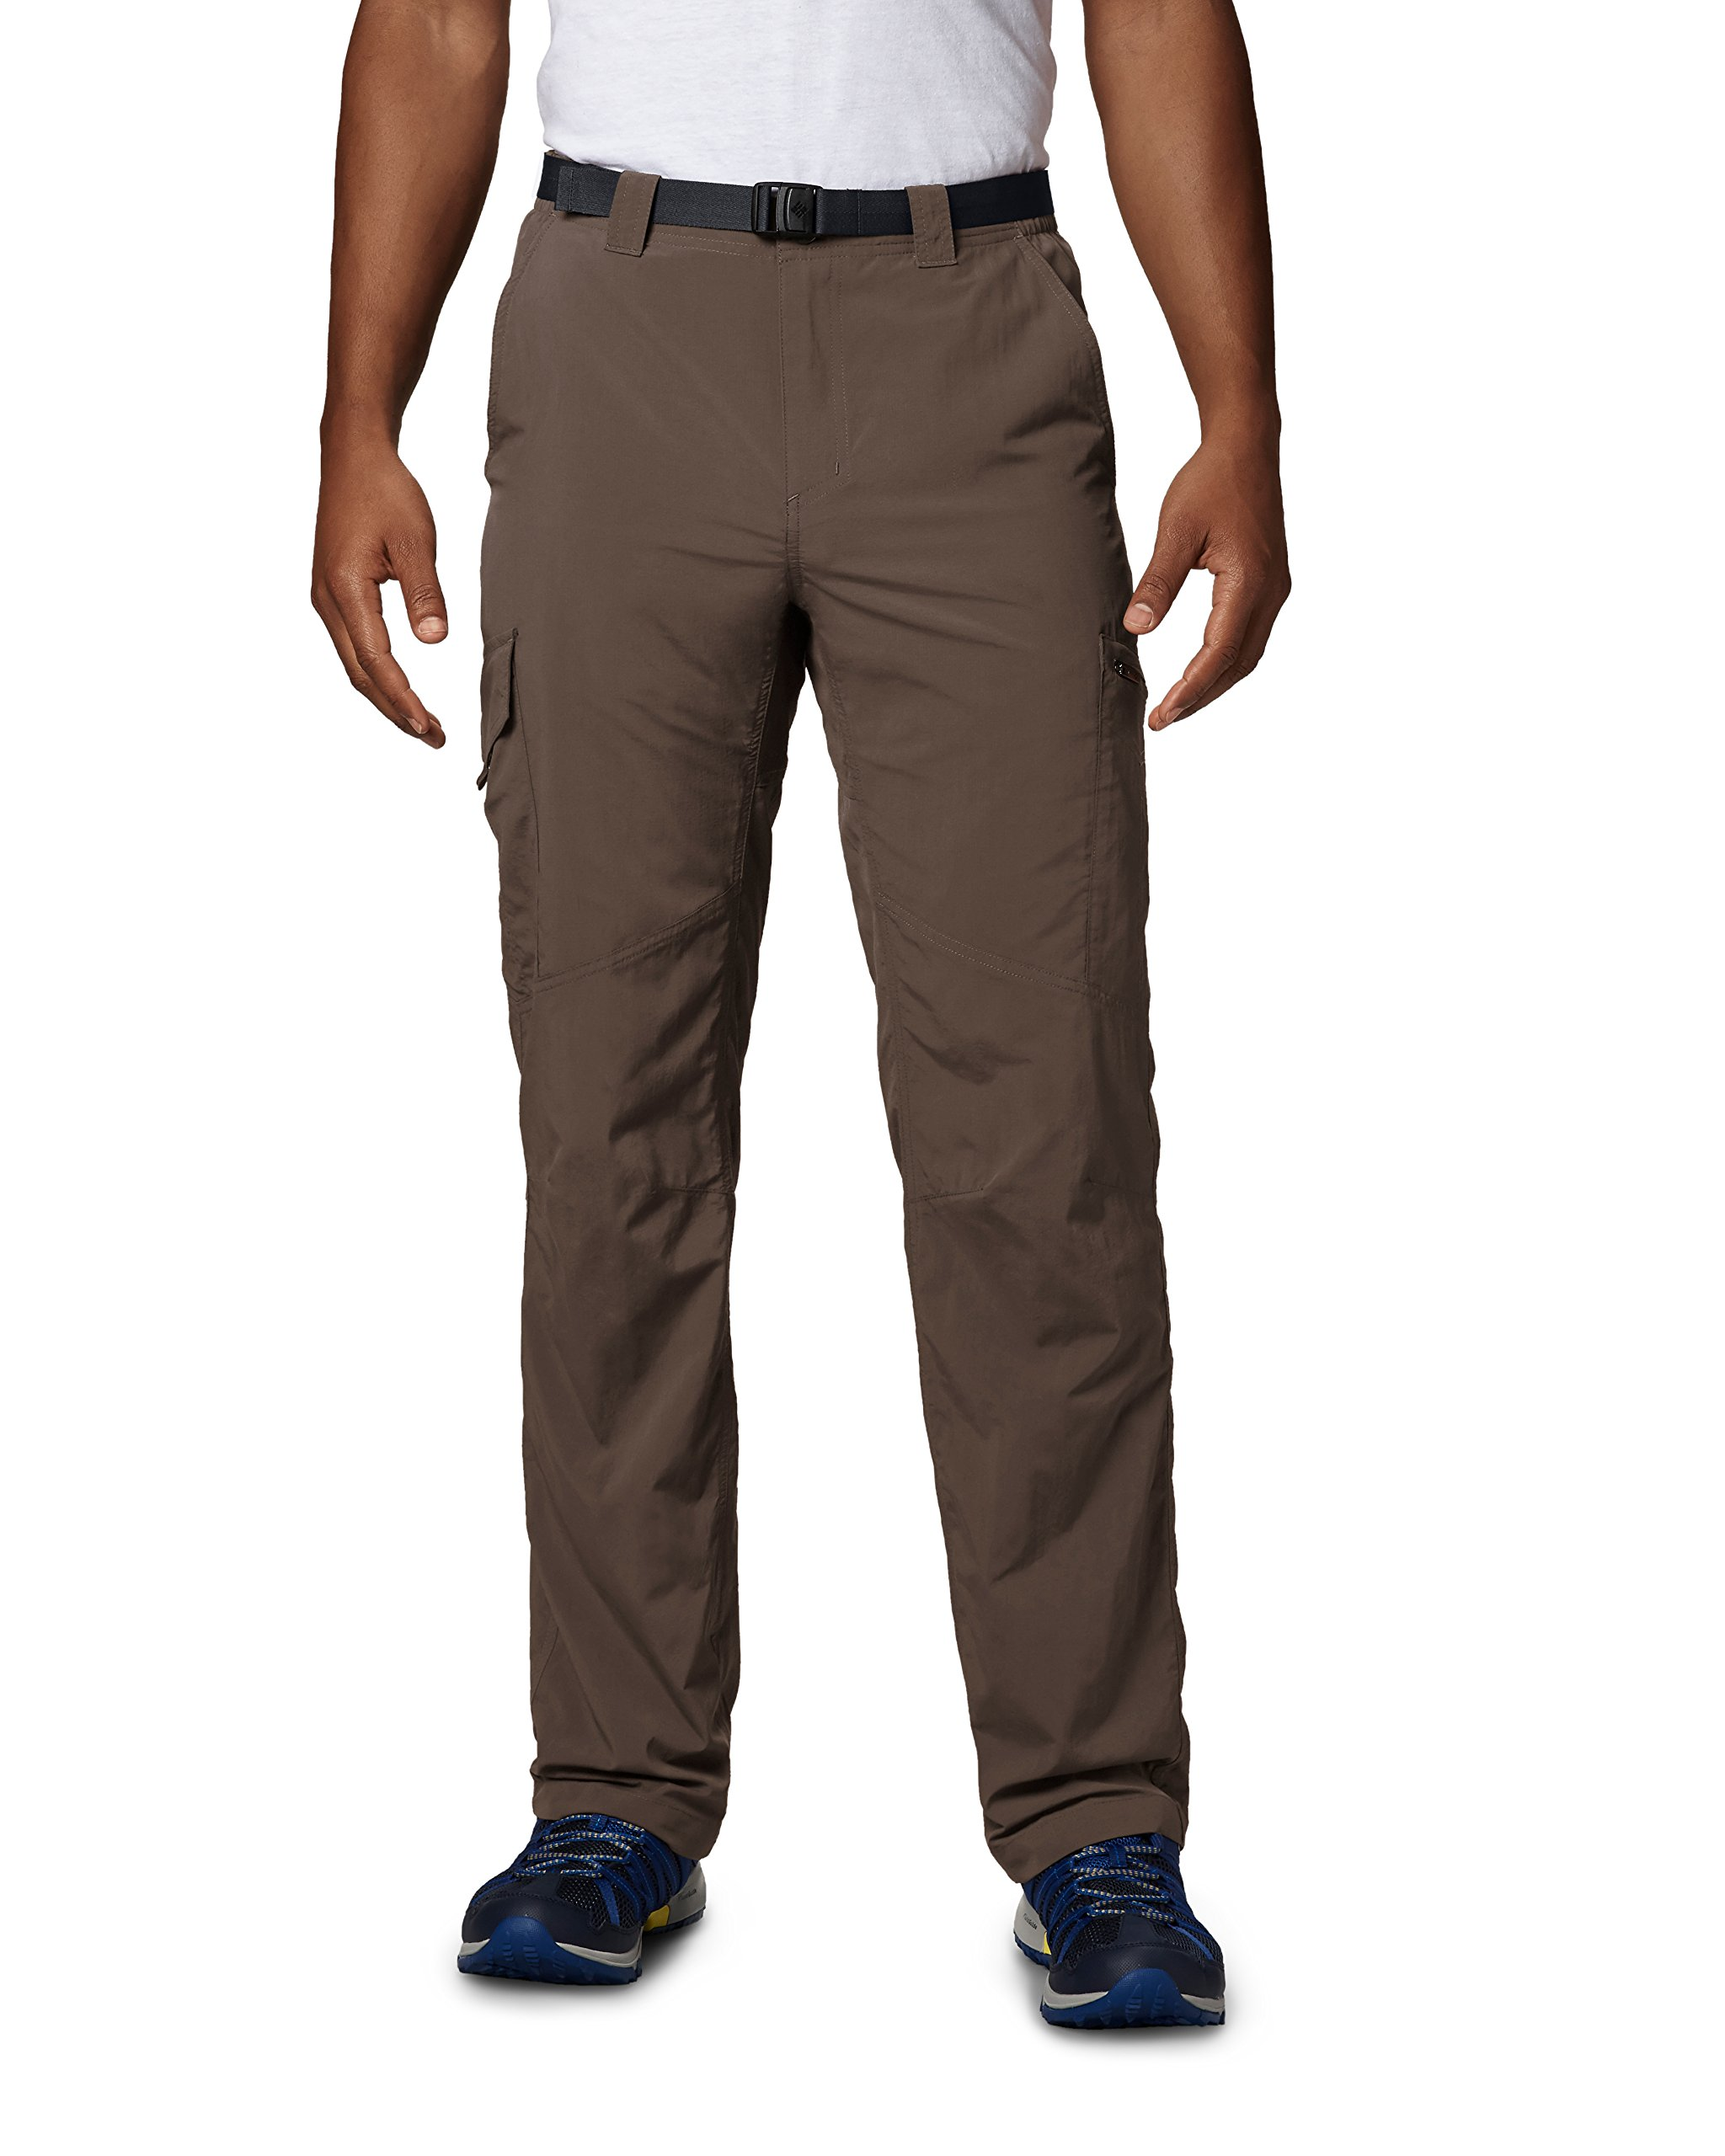 Columbia Men's  Men's Silver Ridge Cargo Pant , Major, 36x30 by Columbia